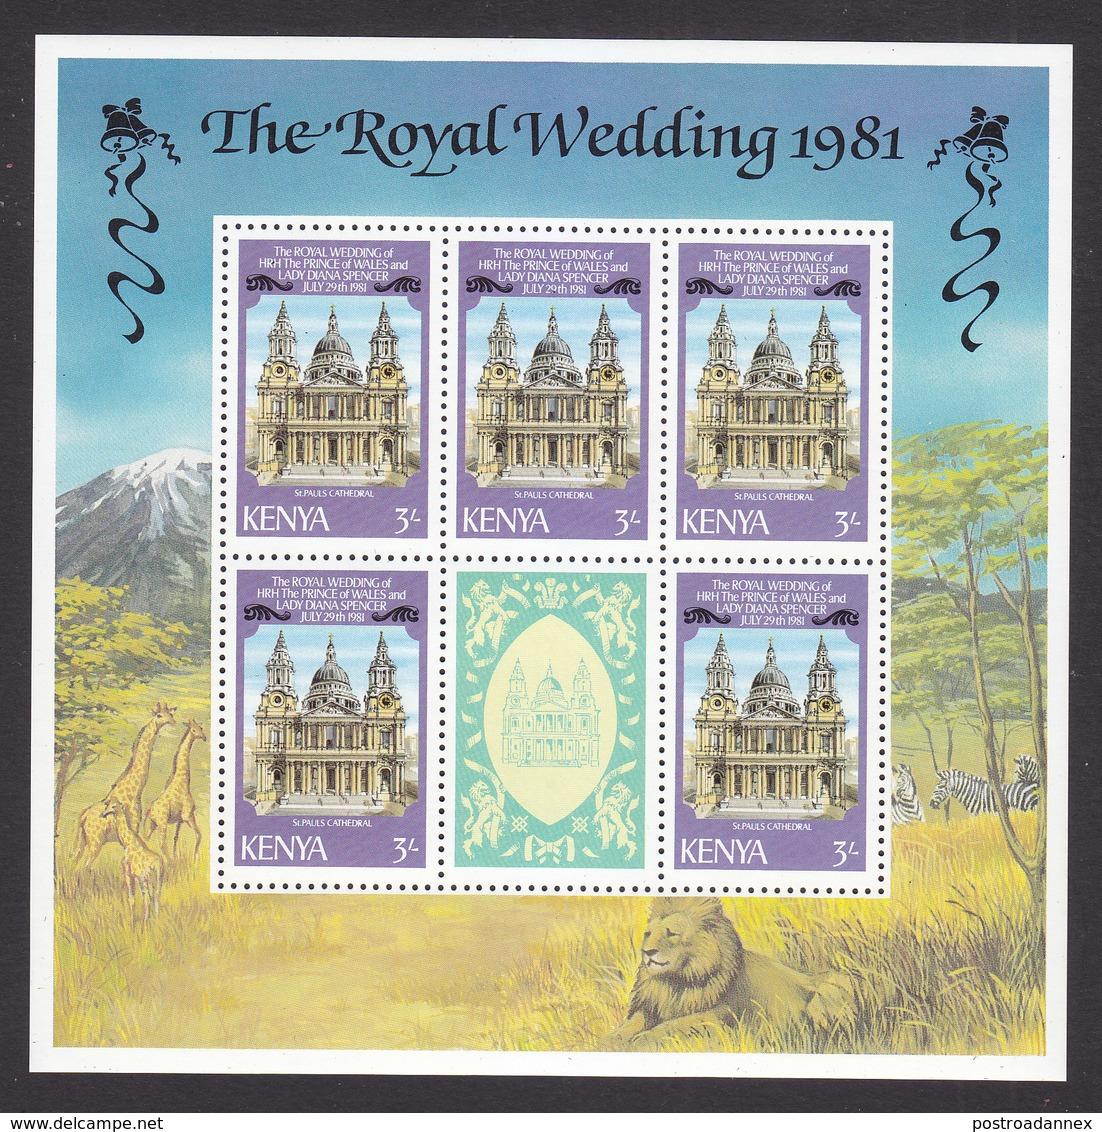 Kenya, Scott #195 Sheet, Mint Never Hinged, Royal Wedding, Issued 1981 - Kenya (1963-...)